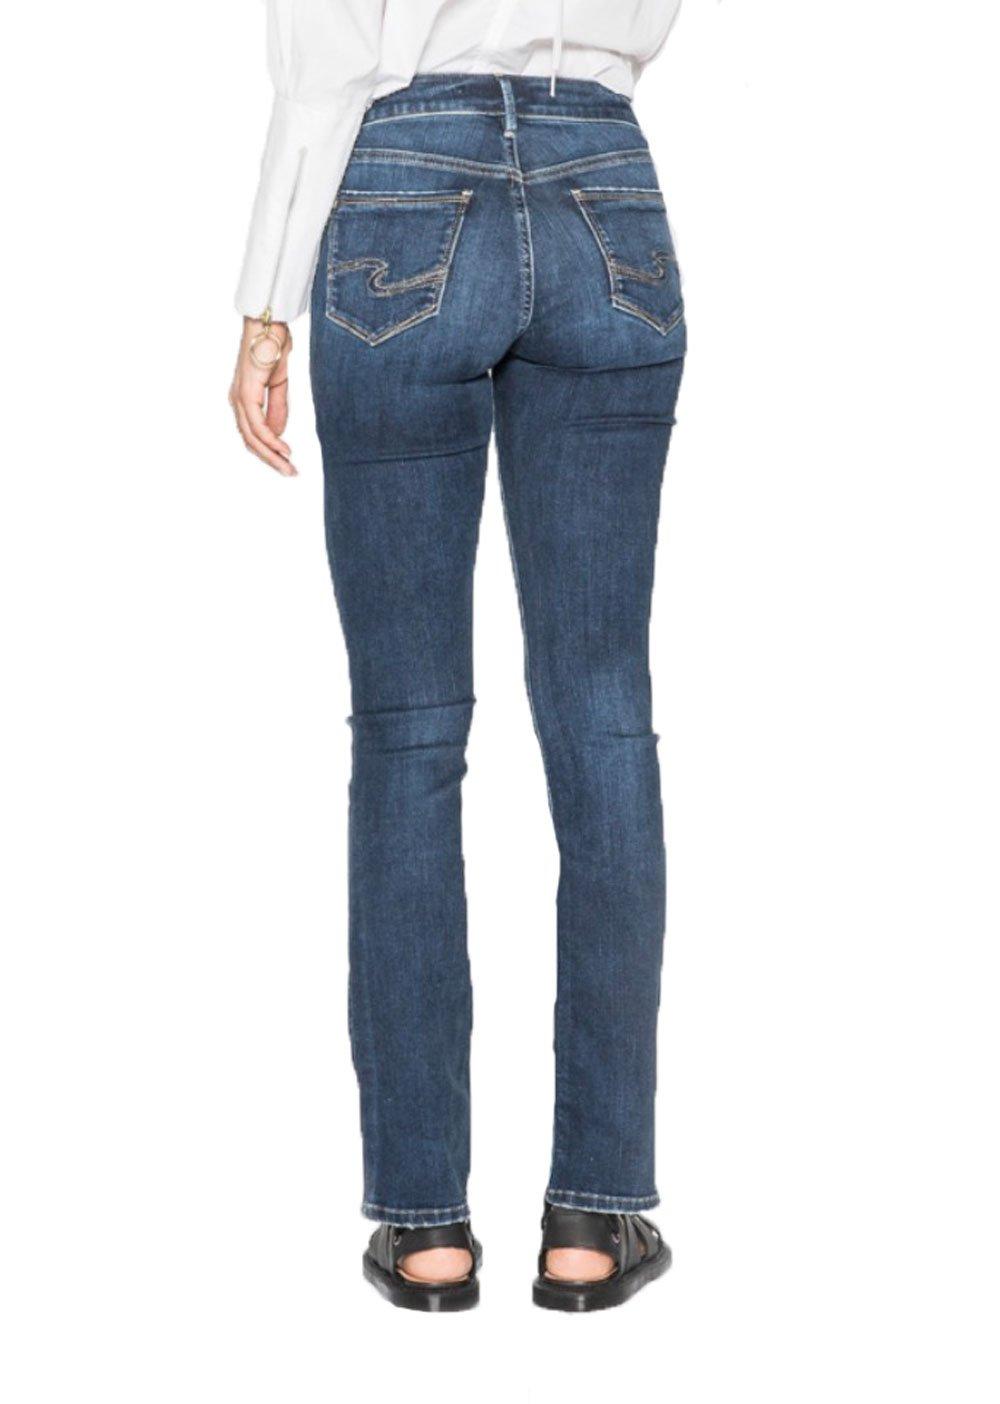 Silver Jeans Co. PANTS レディース B077J8KRF1 26W x 31L|Dark Comfort Stretch Dark Comfort Stretch 26W x 31L